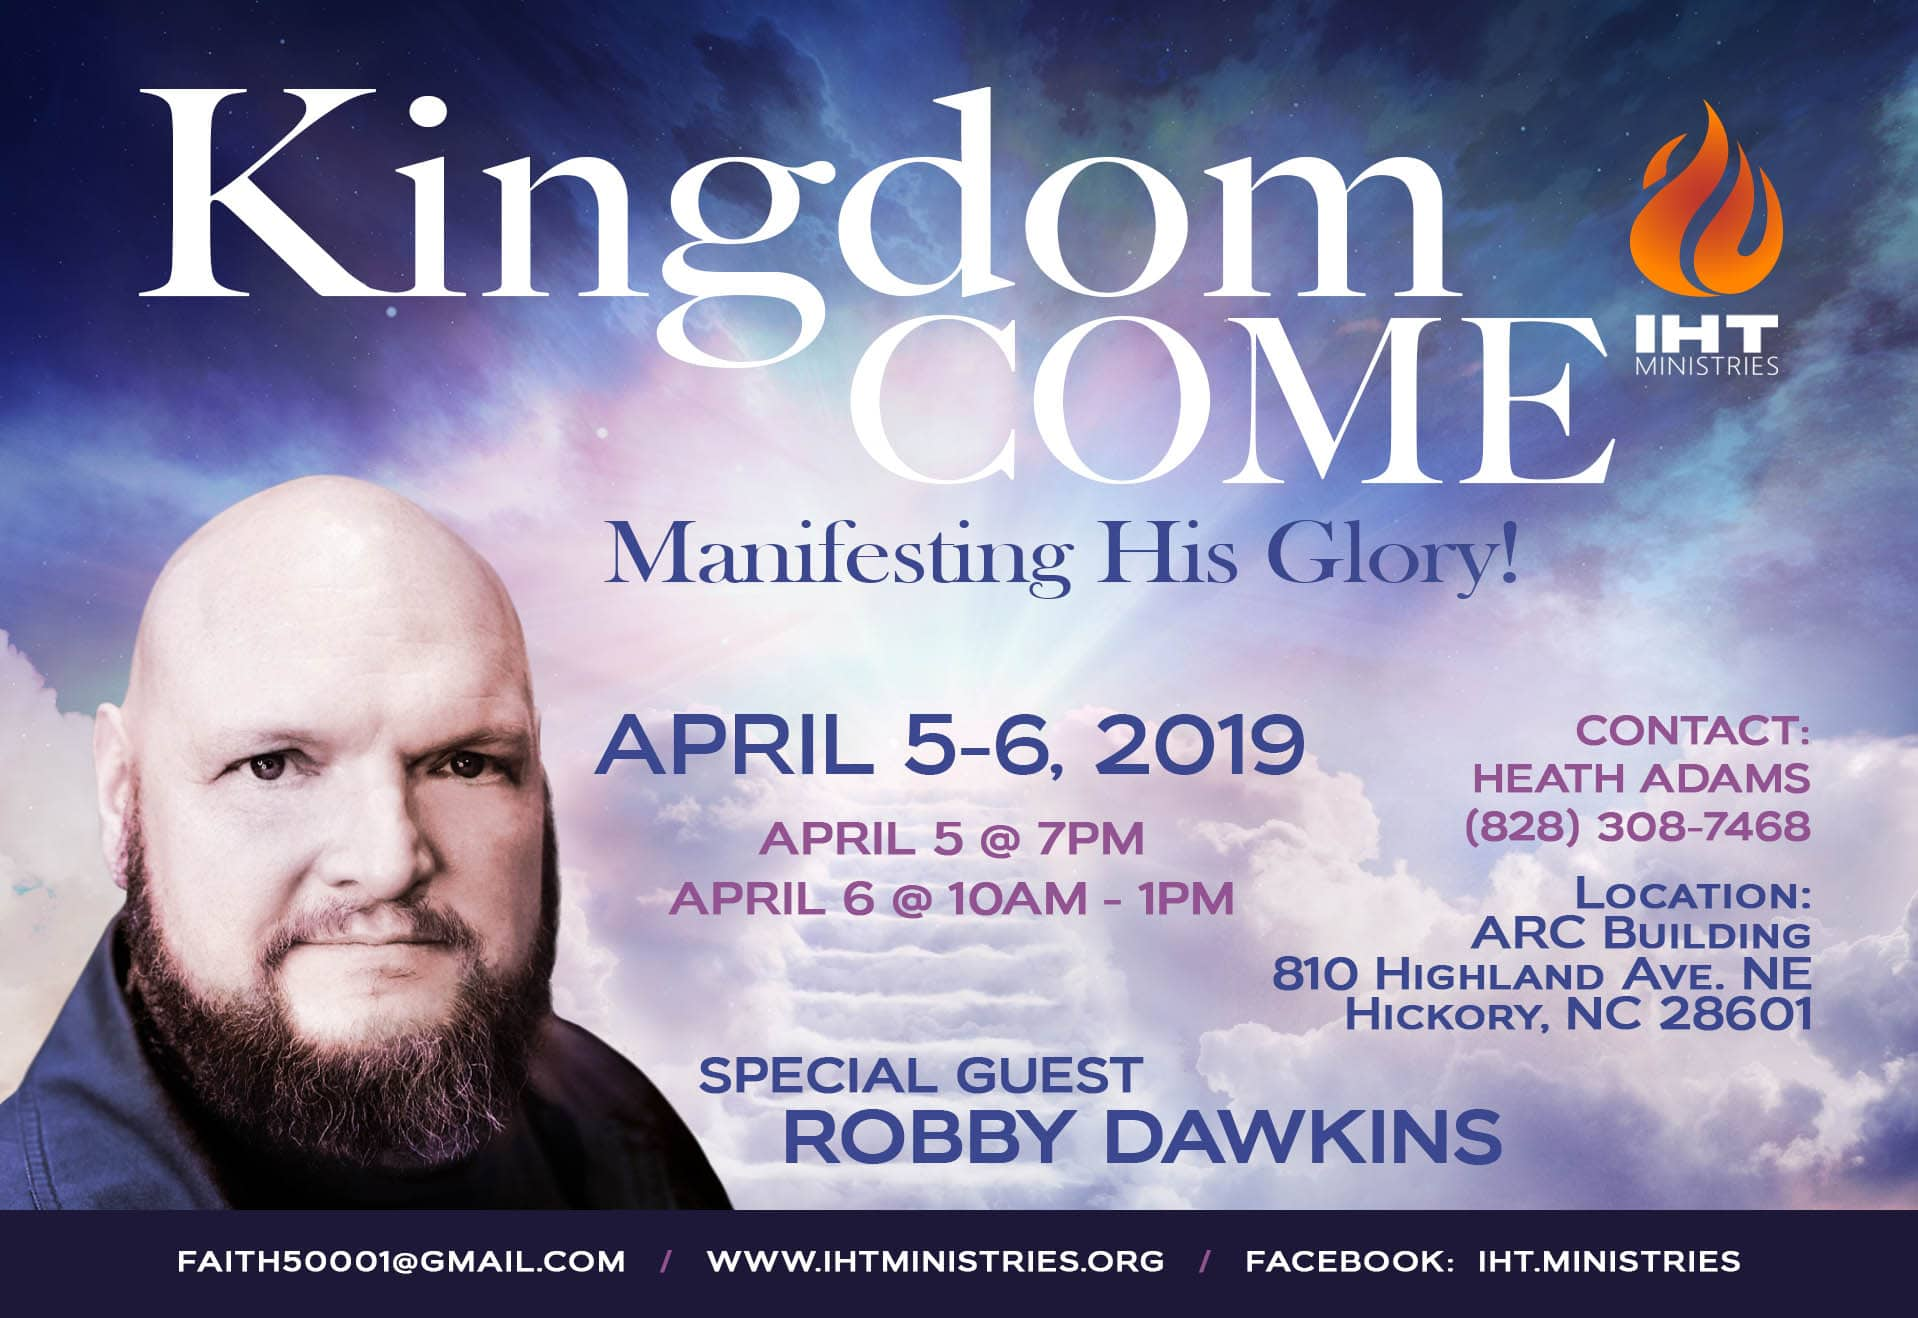 Kingdom Come!